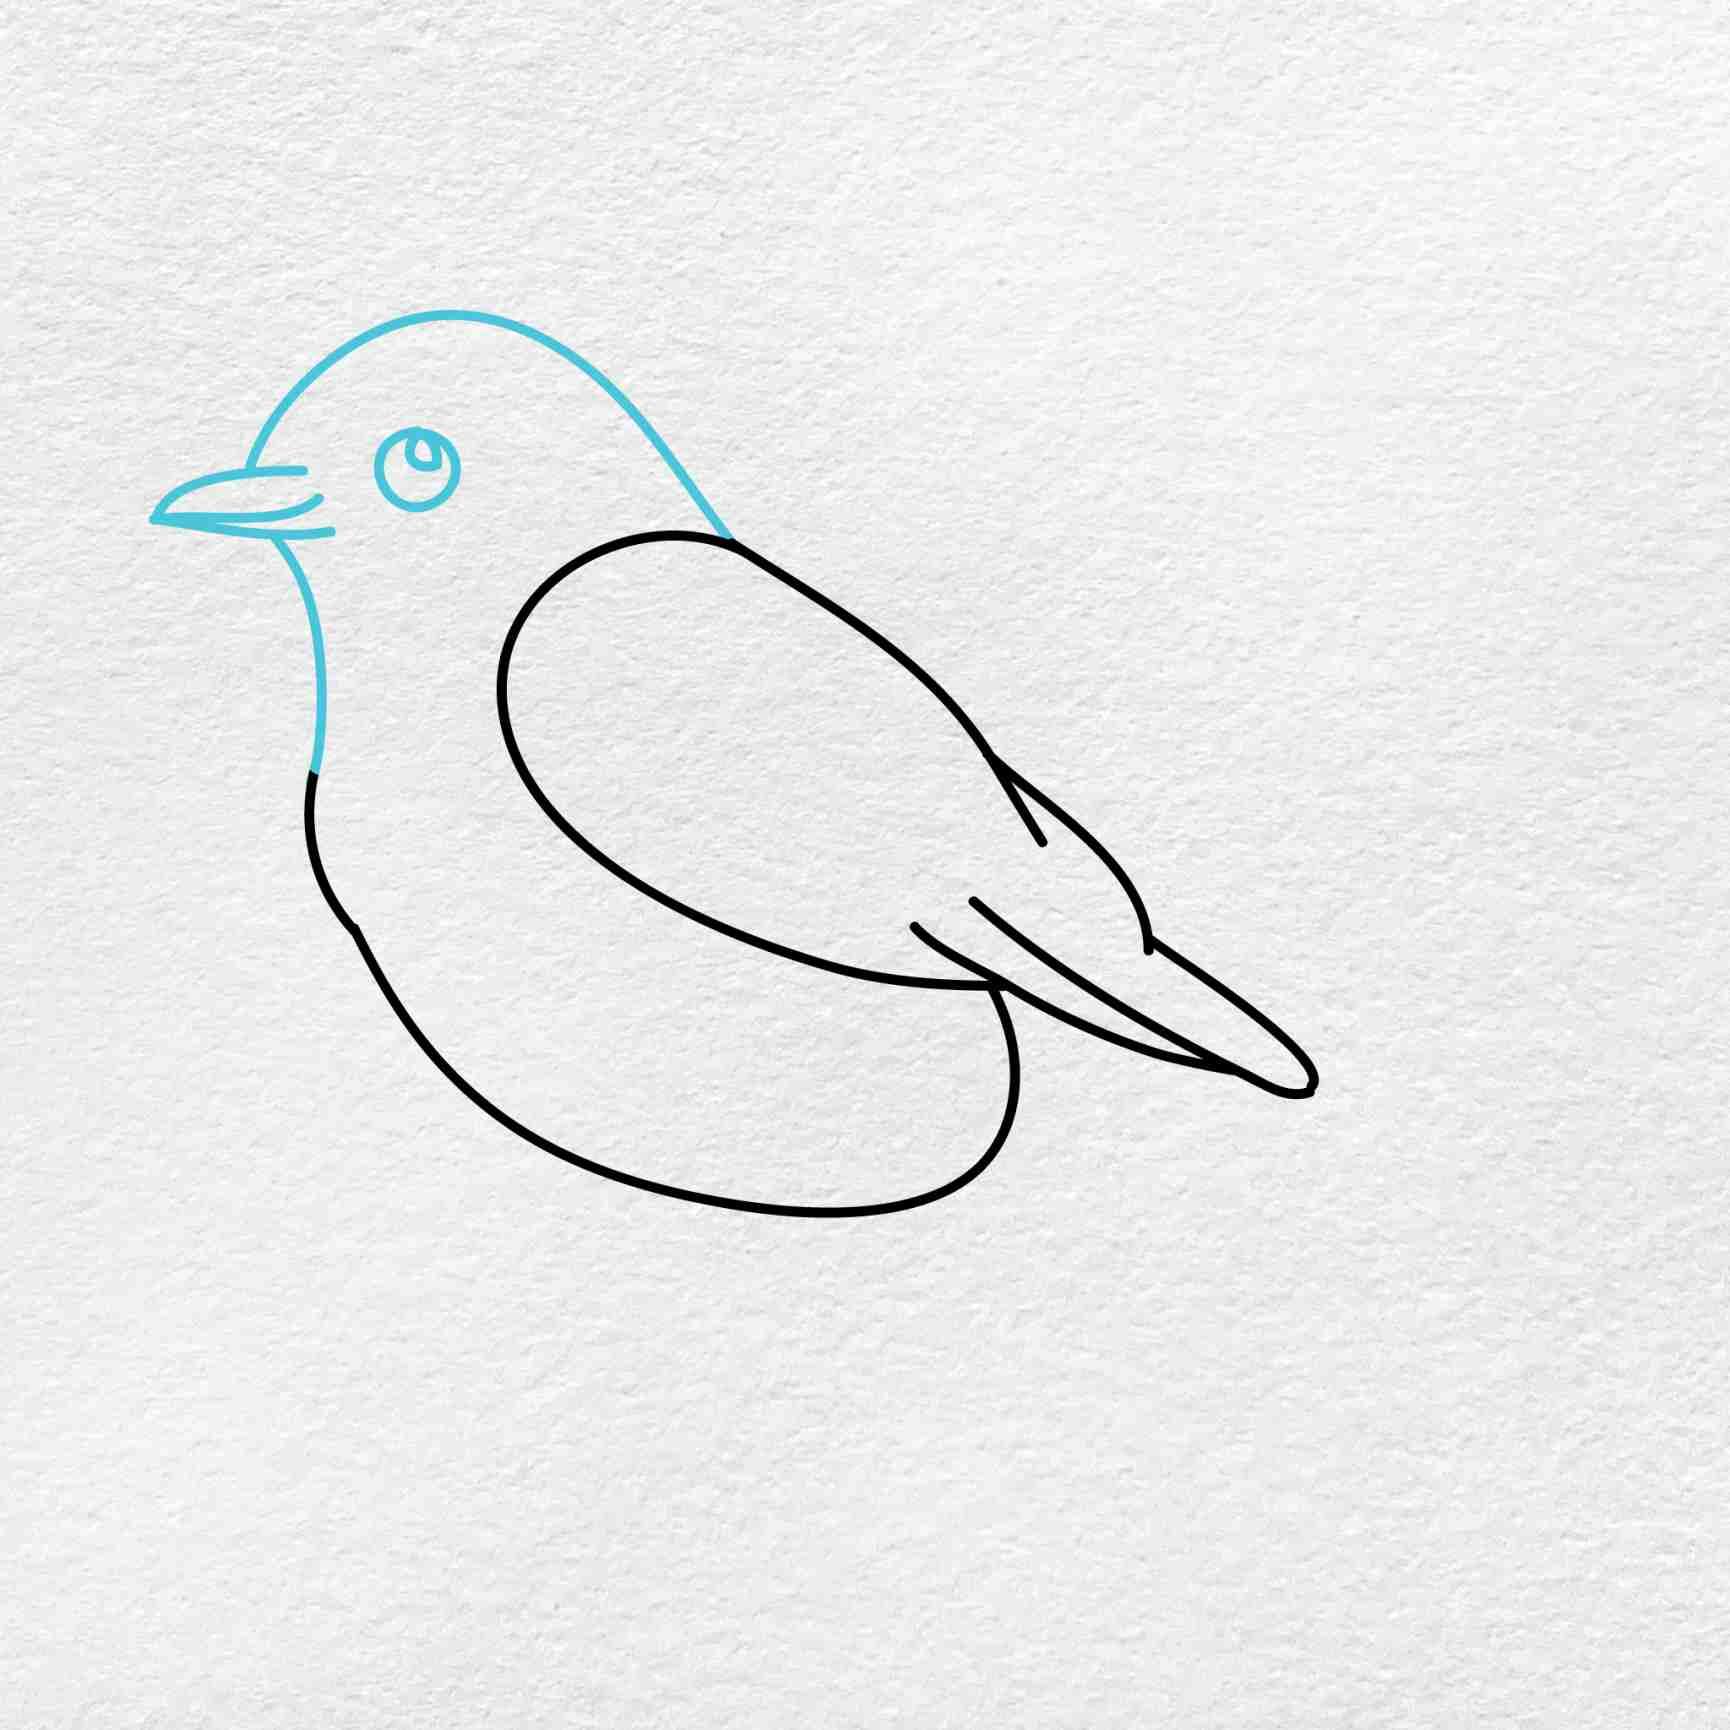 Bluebird Drawing: Step 3